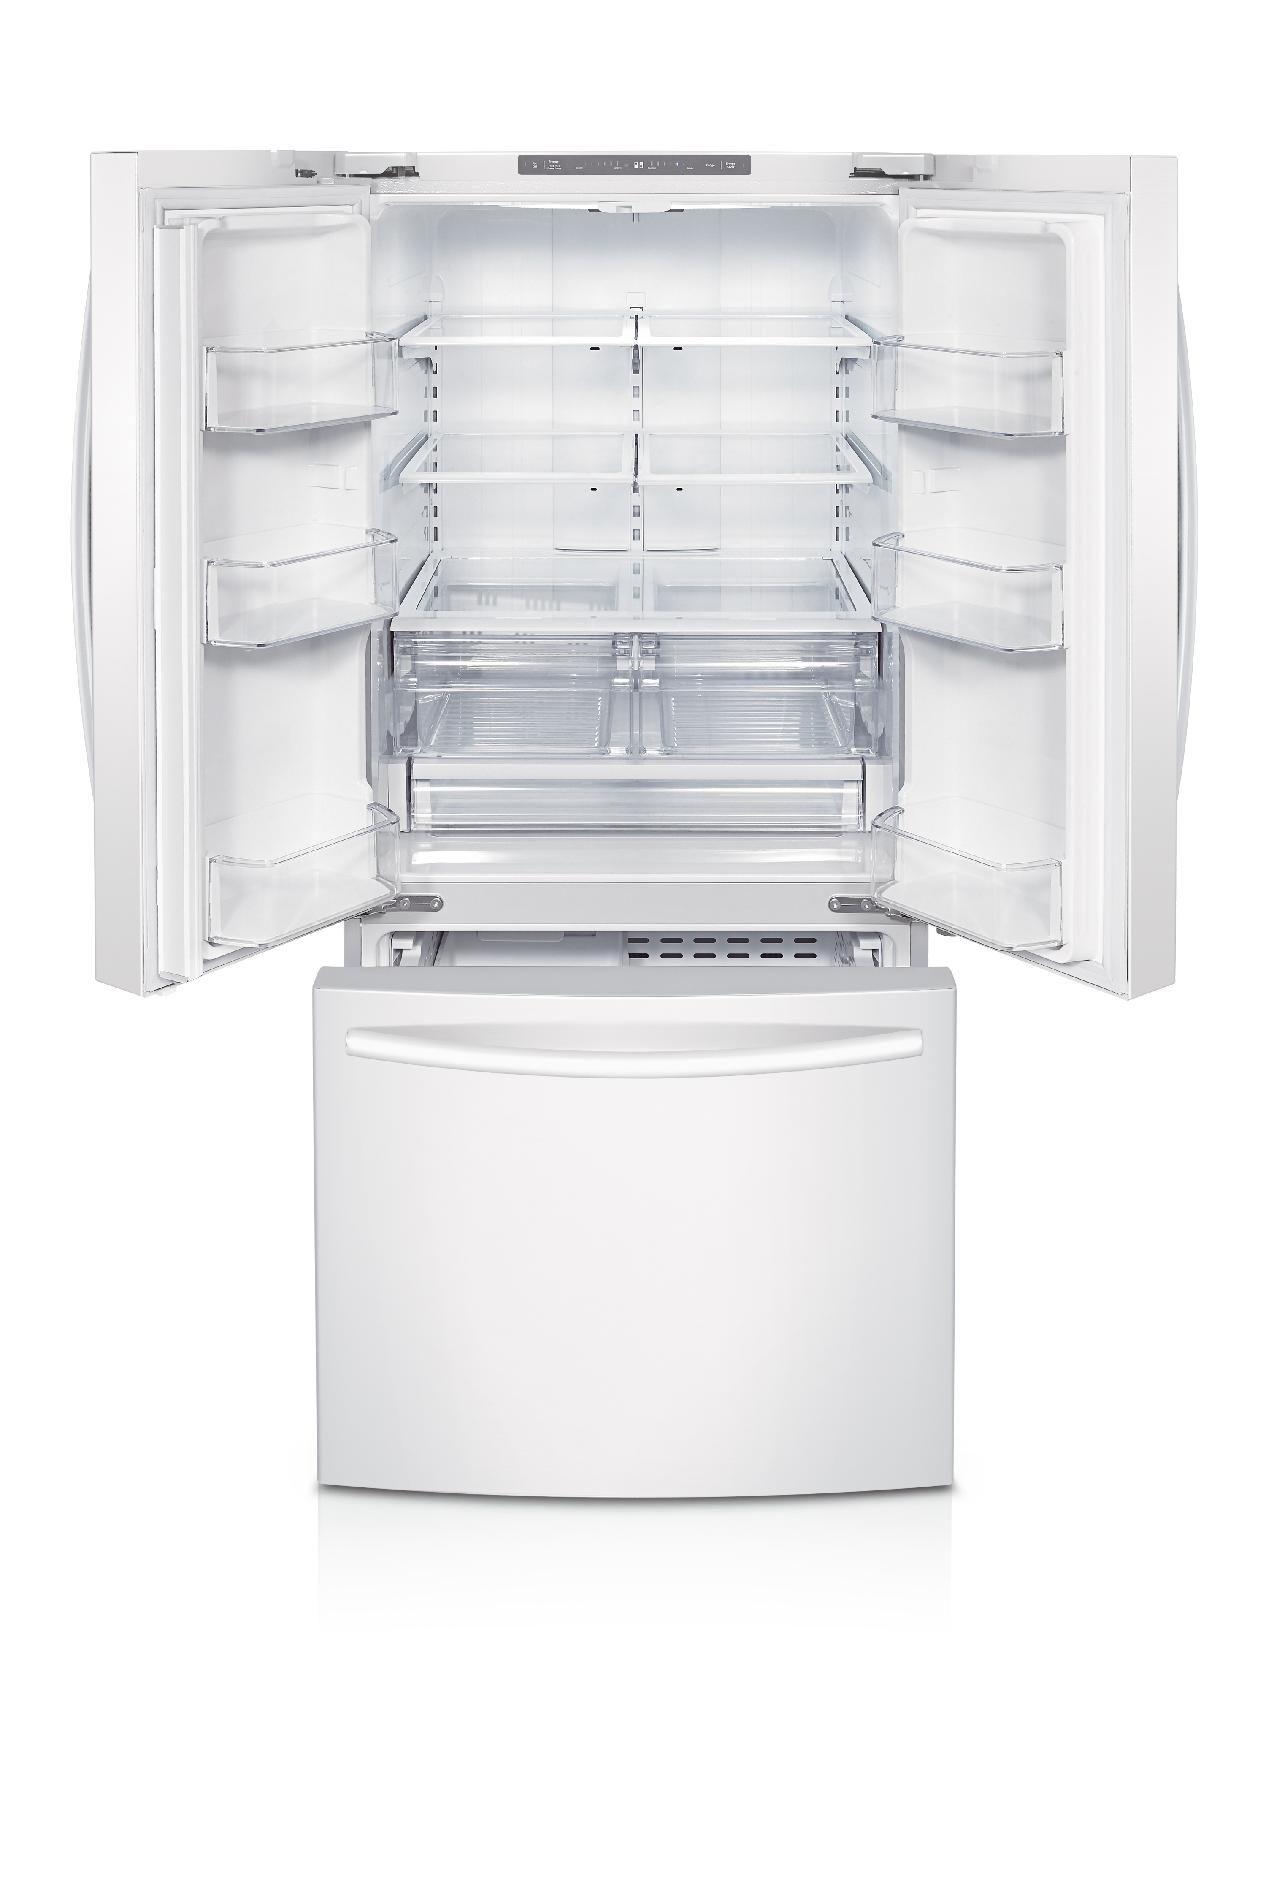 Samsung 22 cu. ft. French Door Refrigerator - White